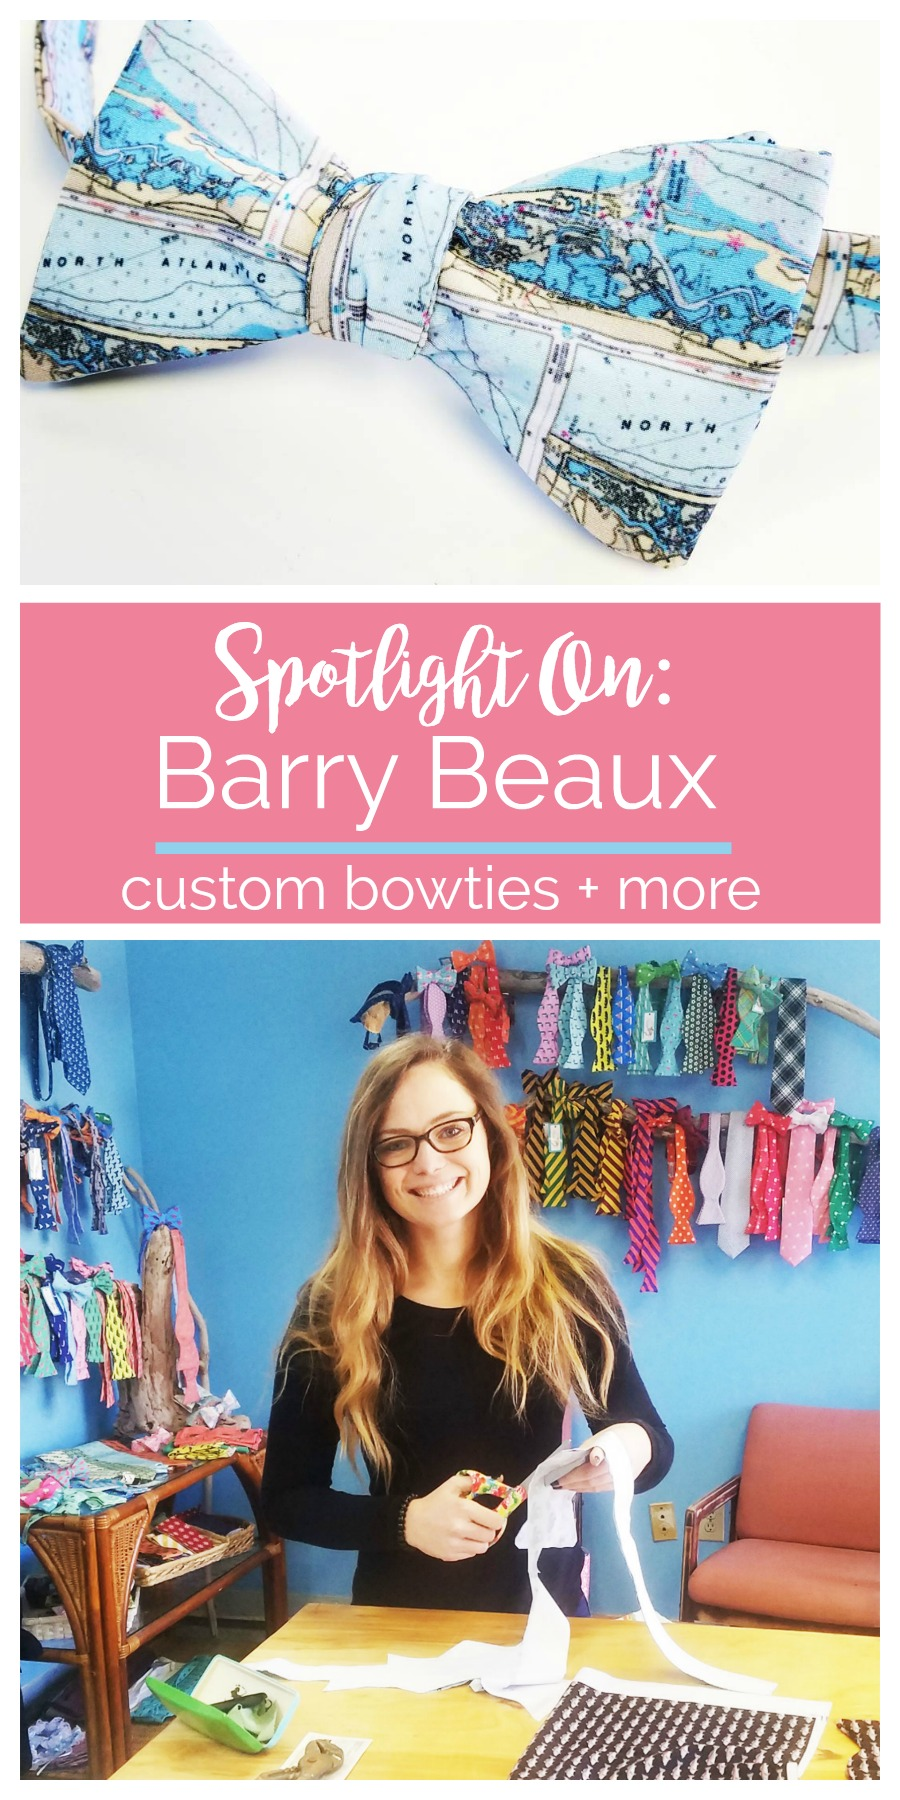 Spotlight On: Barry Beaux   Palmetto State Weddings